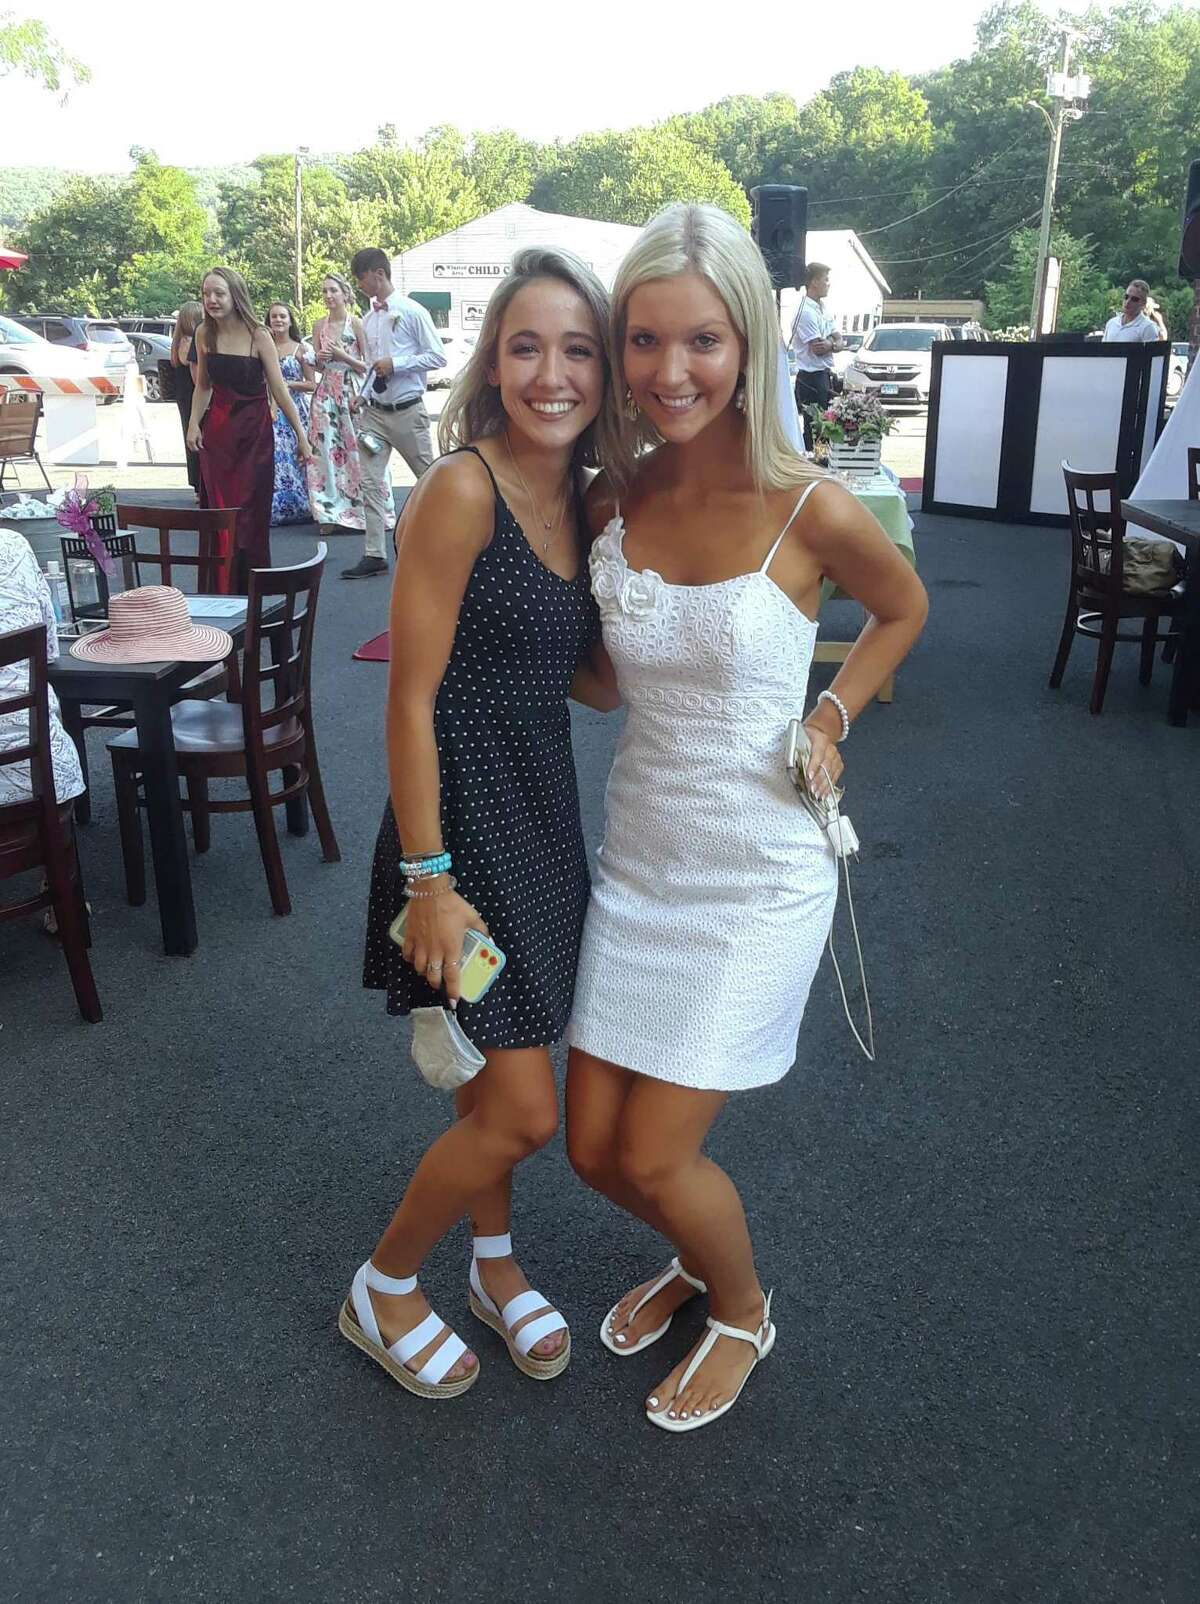 Lydia Bird and Courtney Hamm enjoy the party.